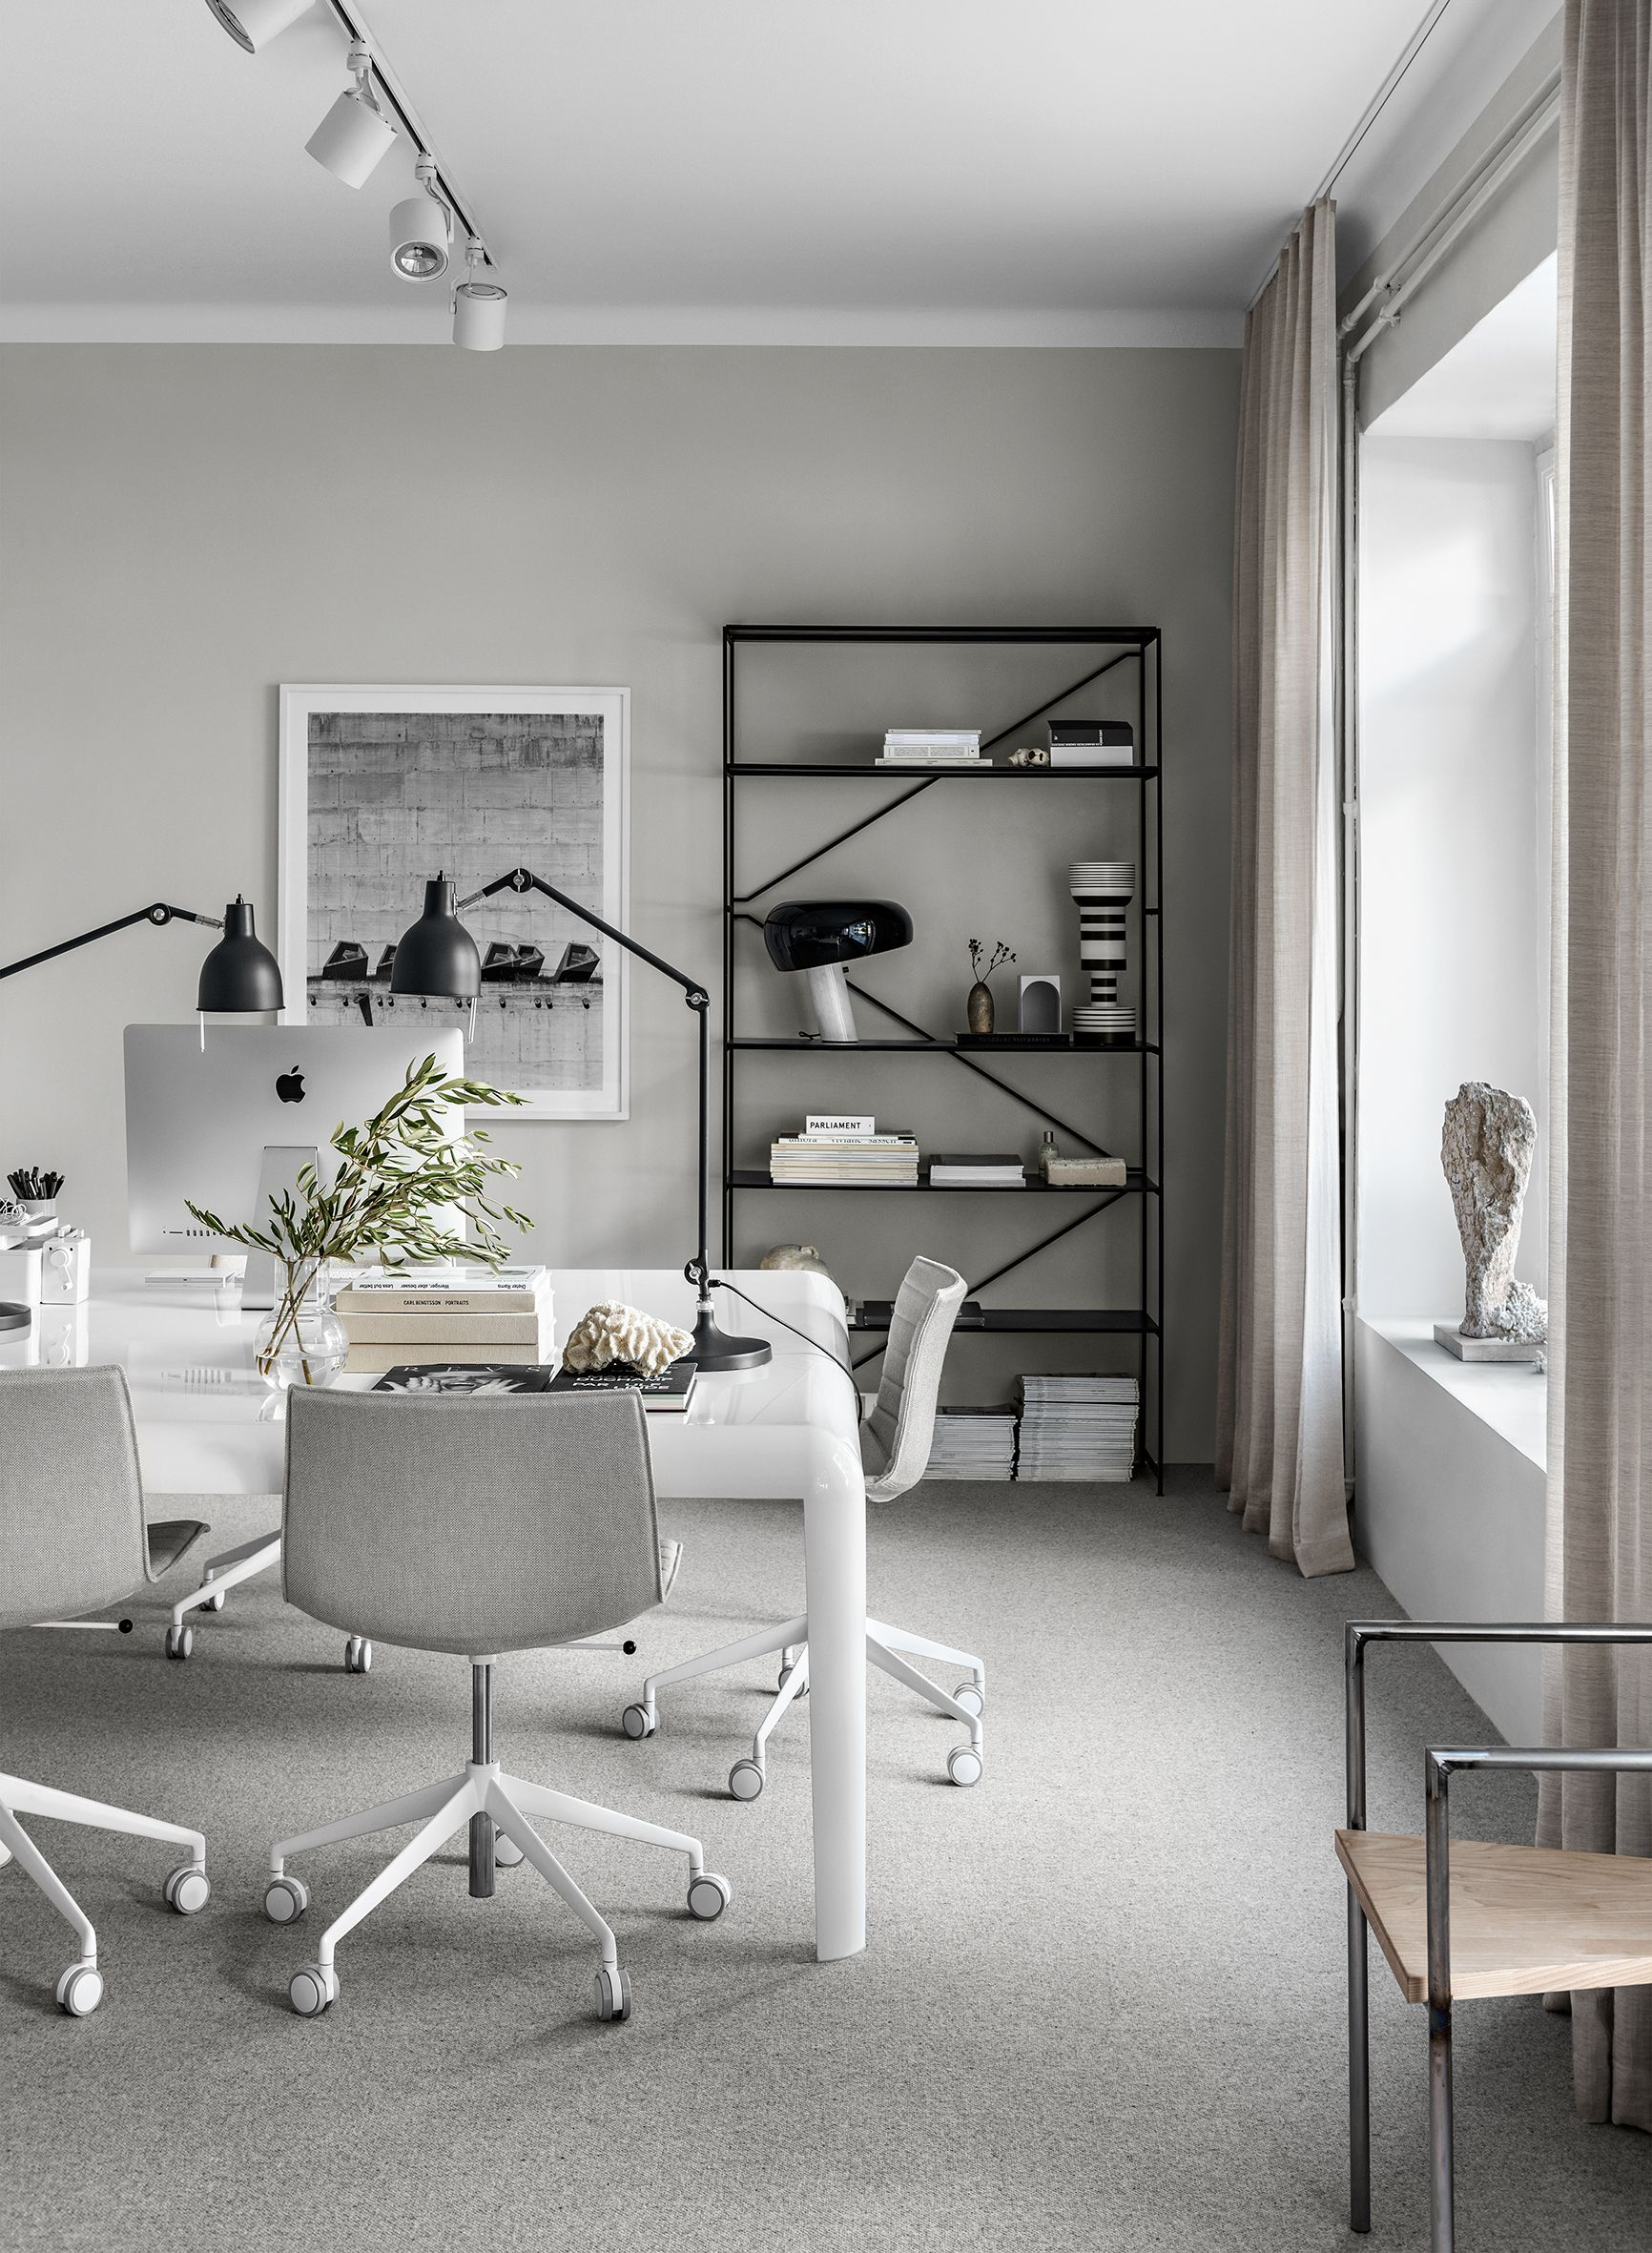 Scandinavian Design Office In 2020 Office Furniture Design Home Office Design Tiny Home Office